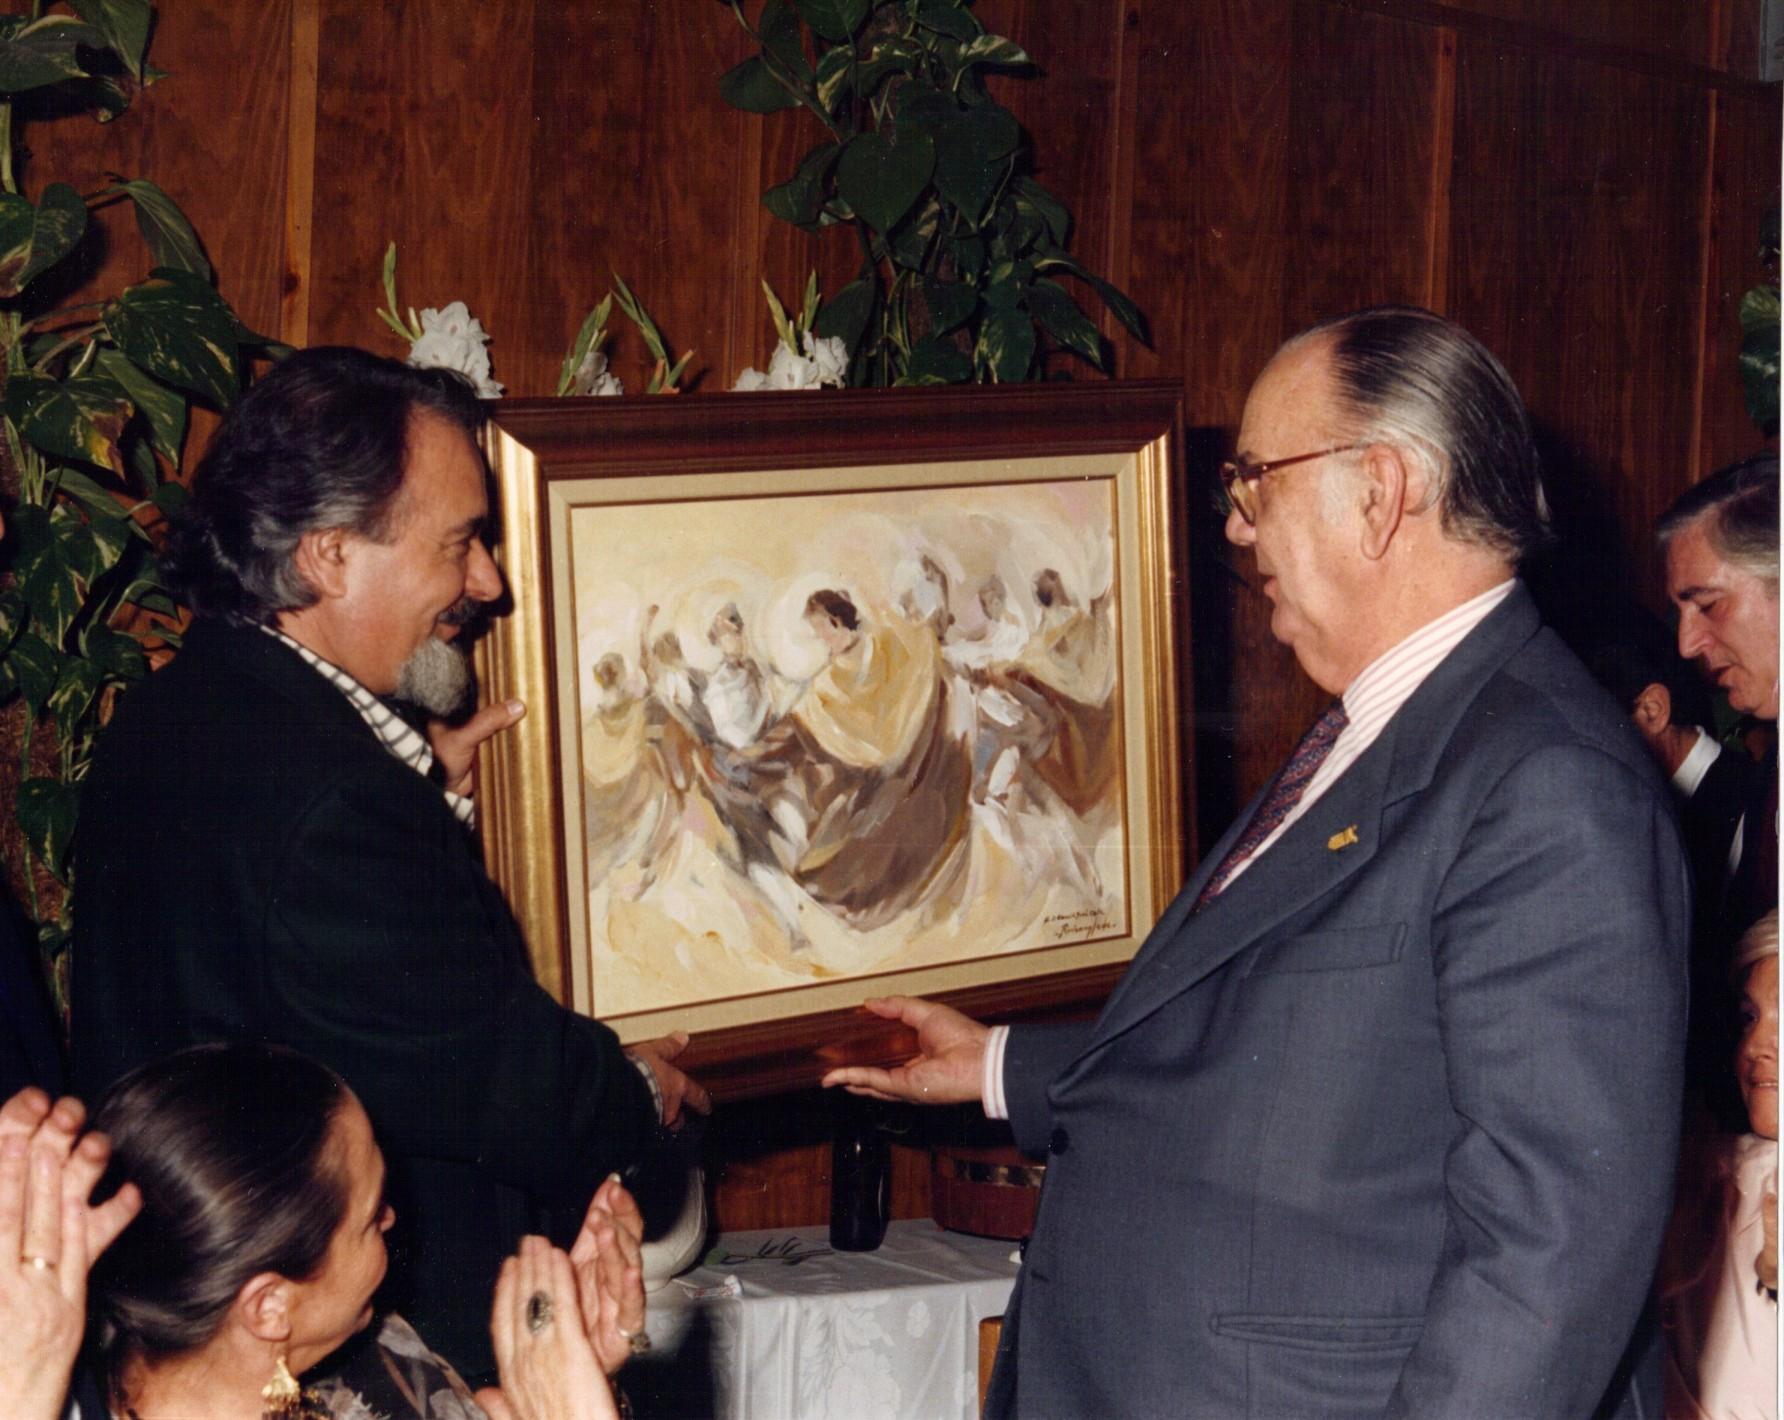 Ruizanglada - 1988 Camilo José Cela recibe una obra de Ruizanglada